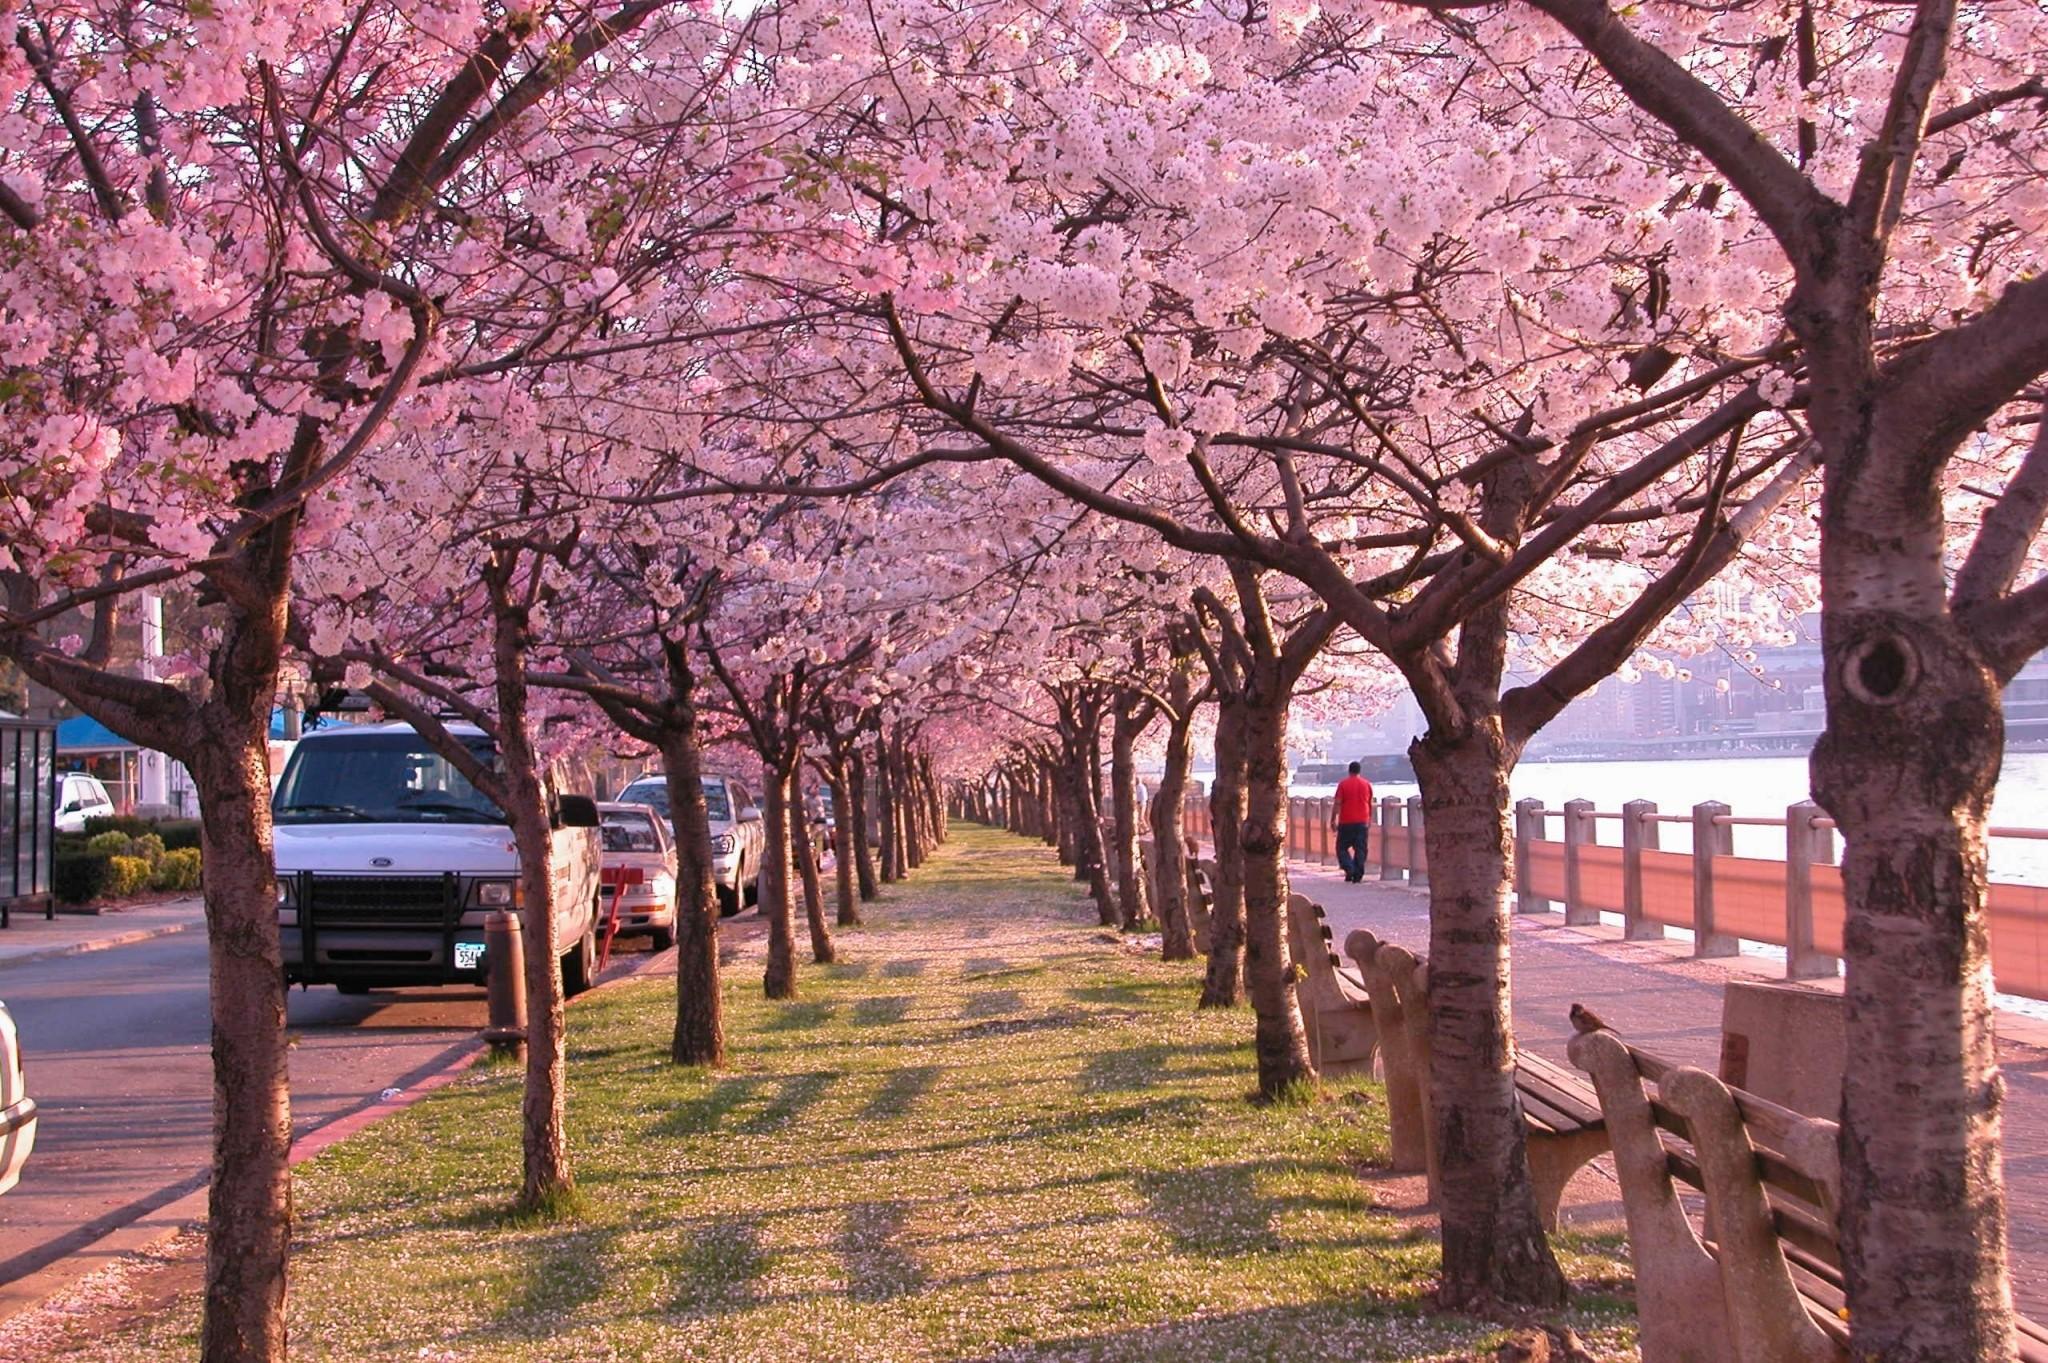 cherry blossom hd widescreen wallpapers for desktop